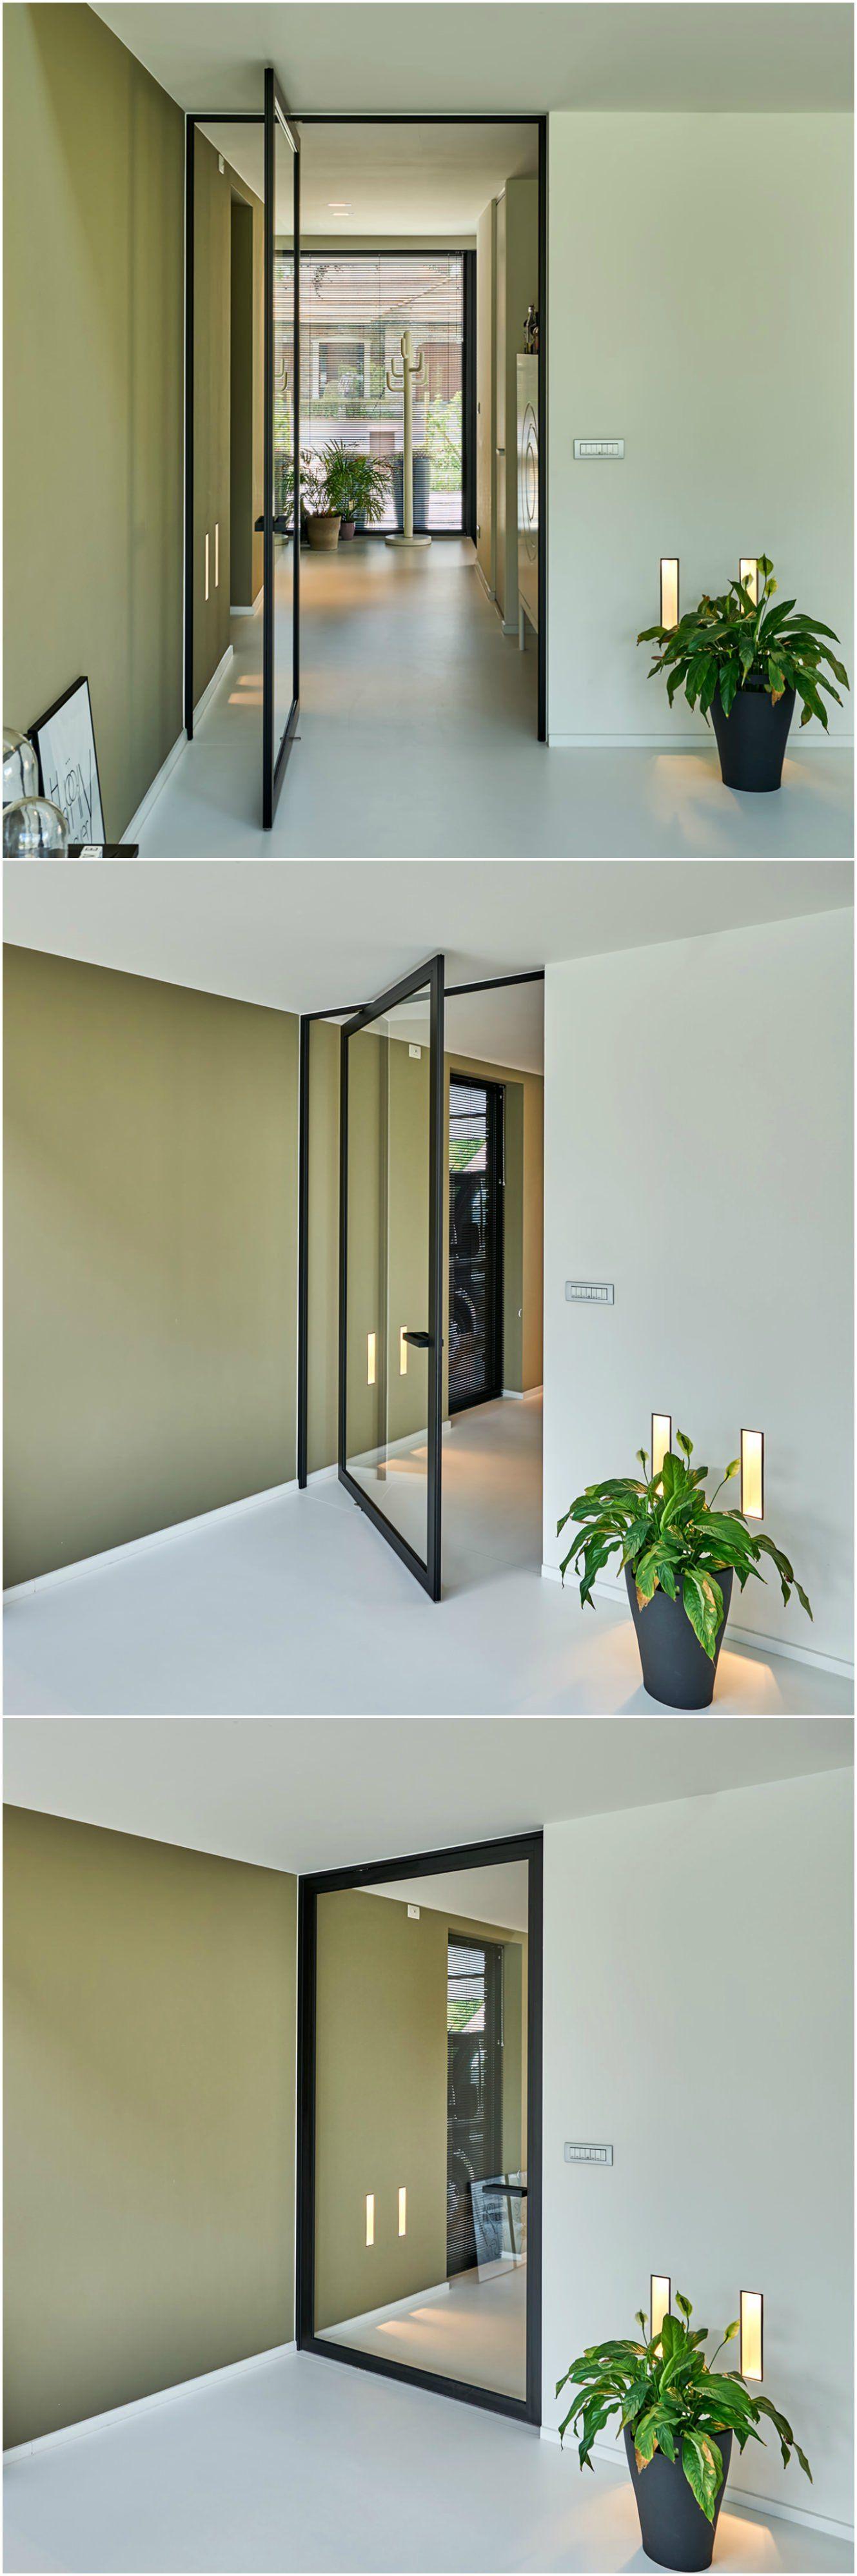 porte vitr e sur pivot d sax type steel look hall. Black Bedroom Furniture Sets. Home Design Ideas